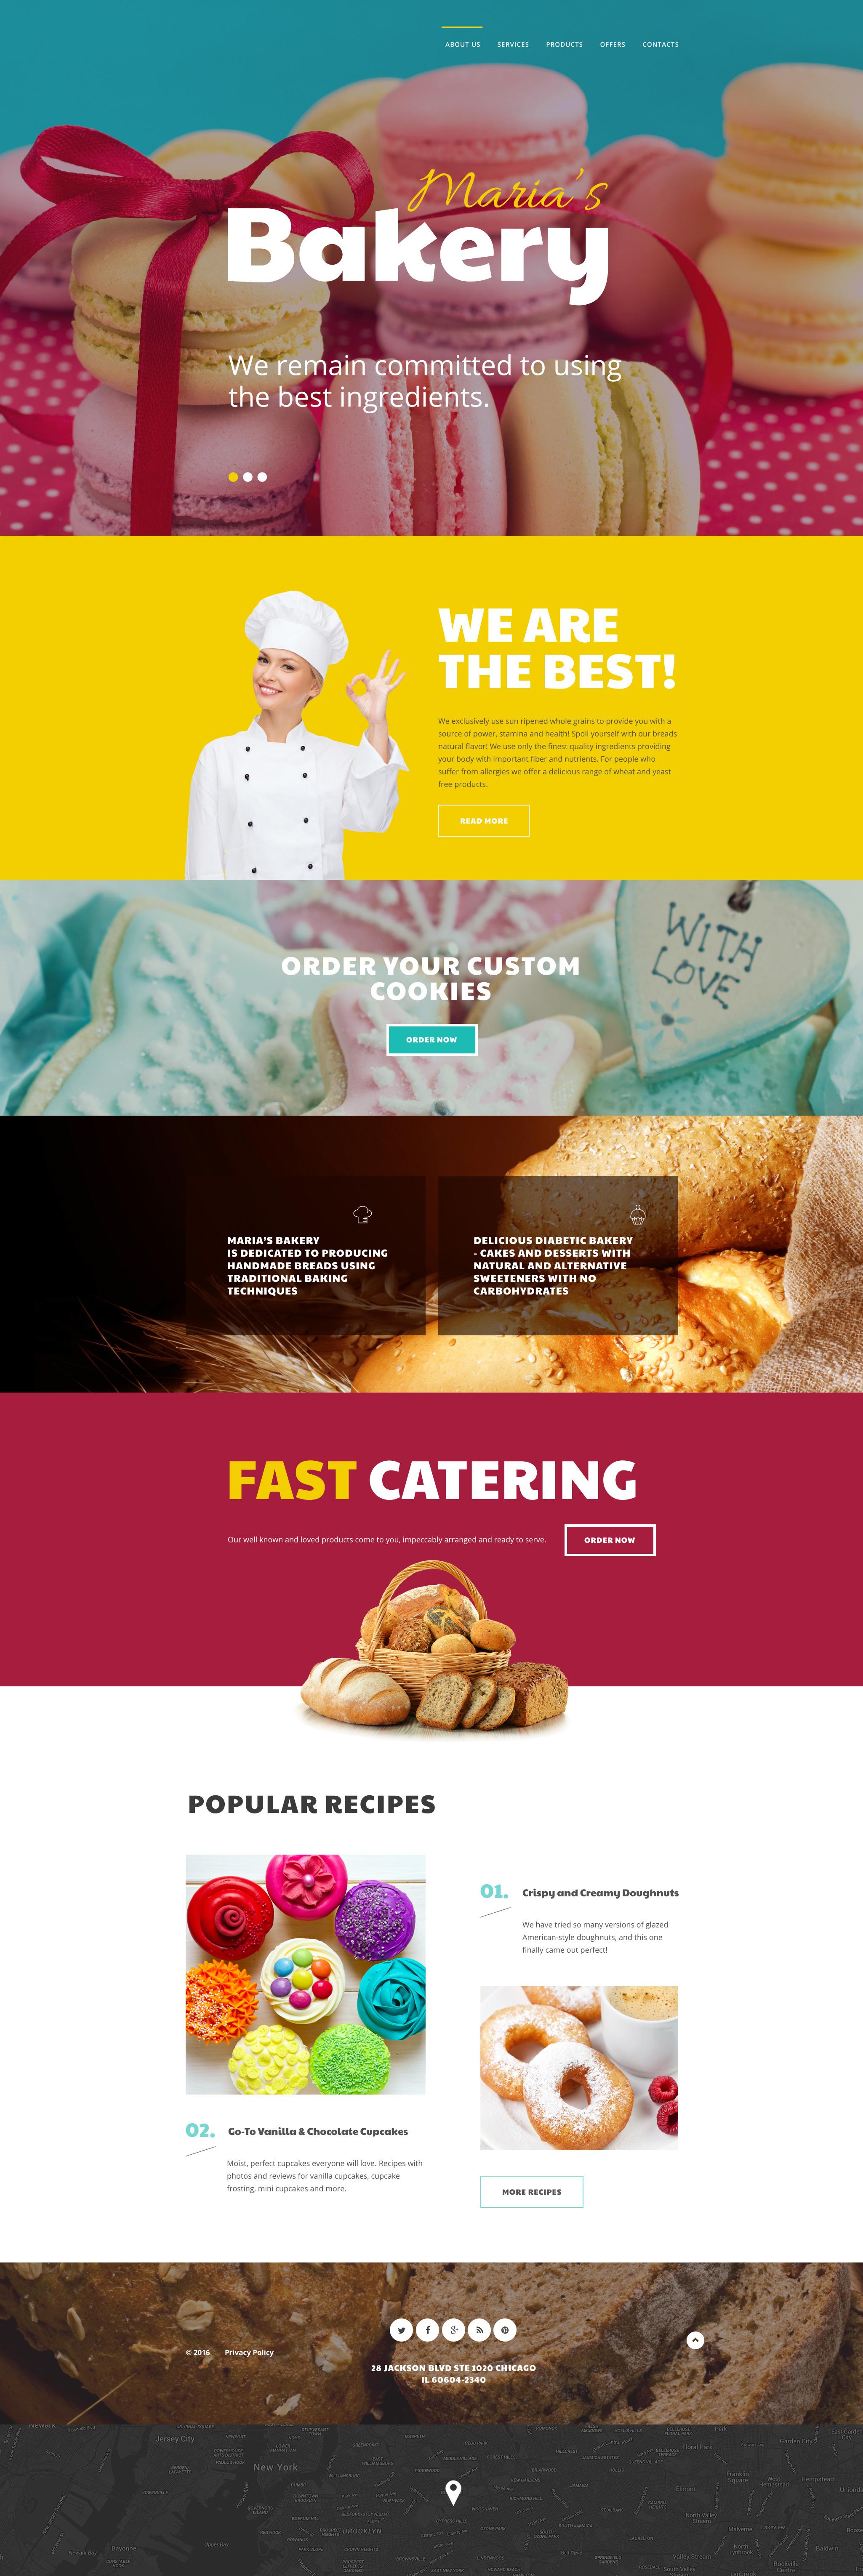 """Maria's Bakery"" modèle web adaptatif #58701 - screenshot"